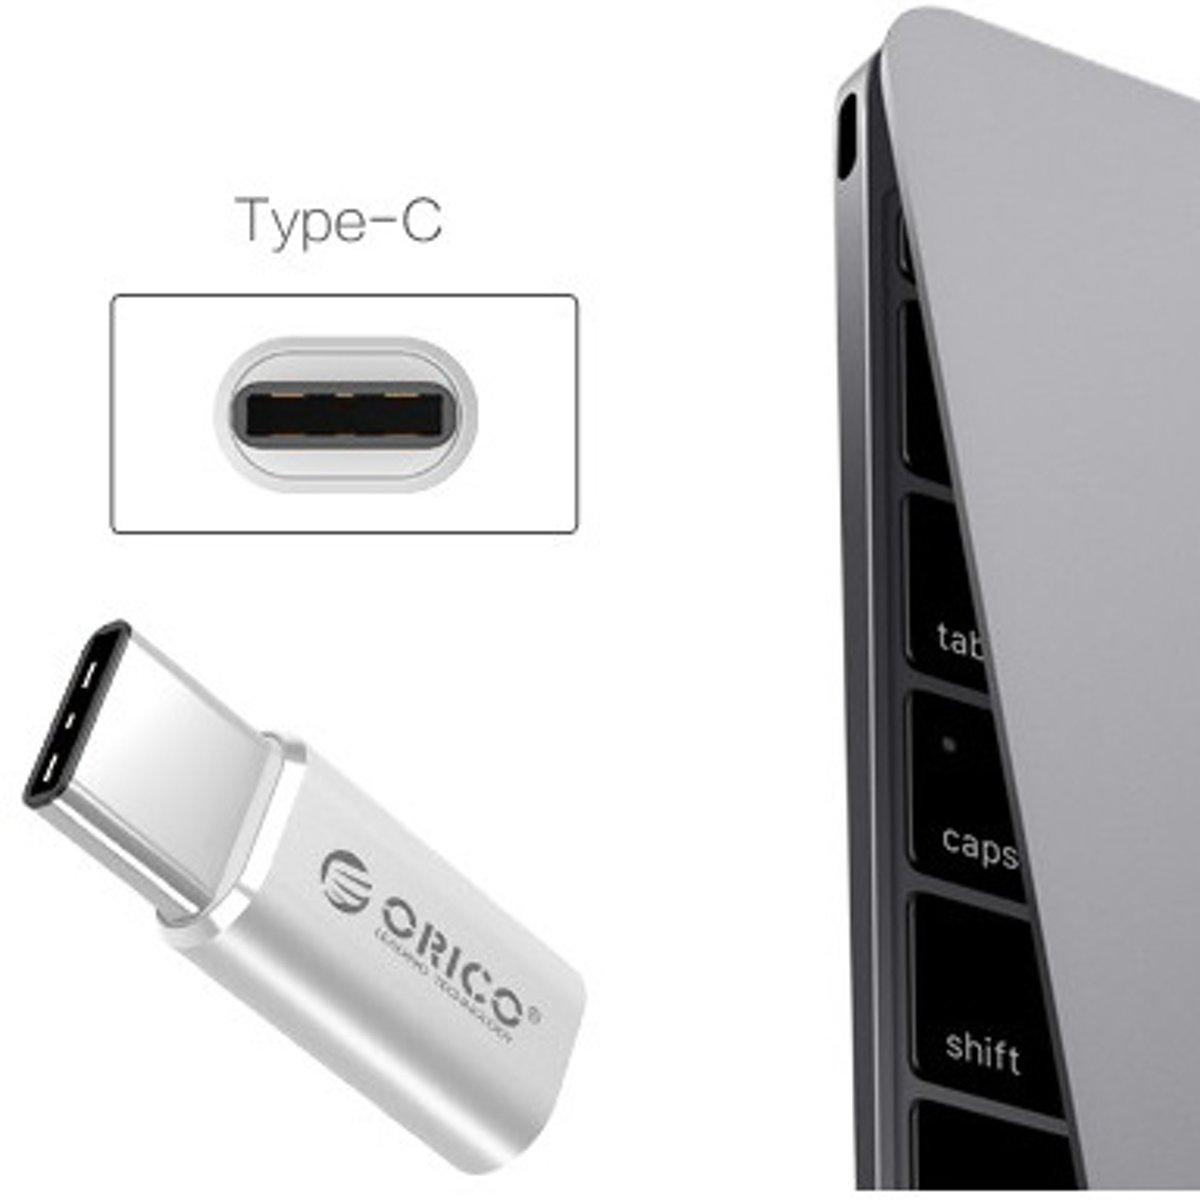 Orico Type C Adapter Usb 31 Naar Micro 20 To Converter Ctm1 Silver Aluminium